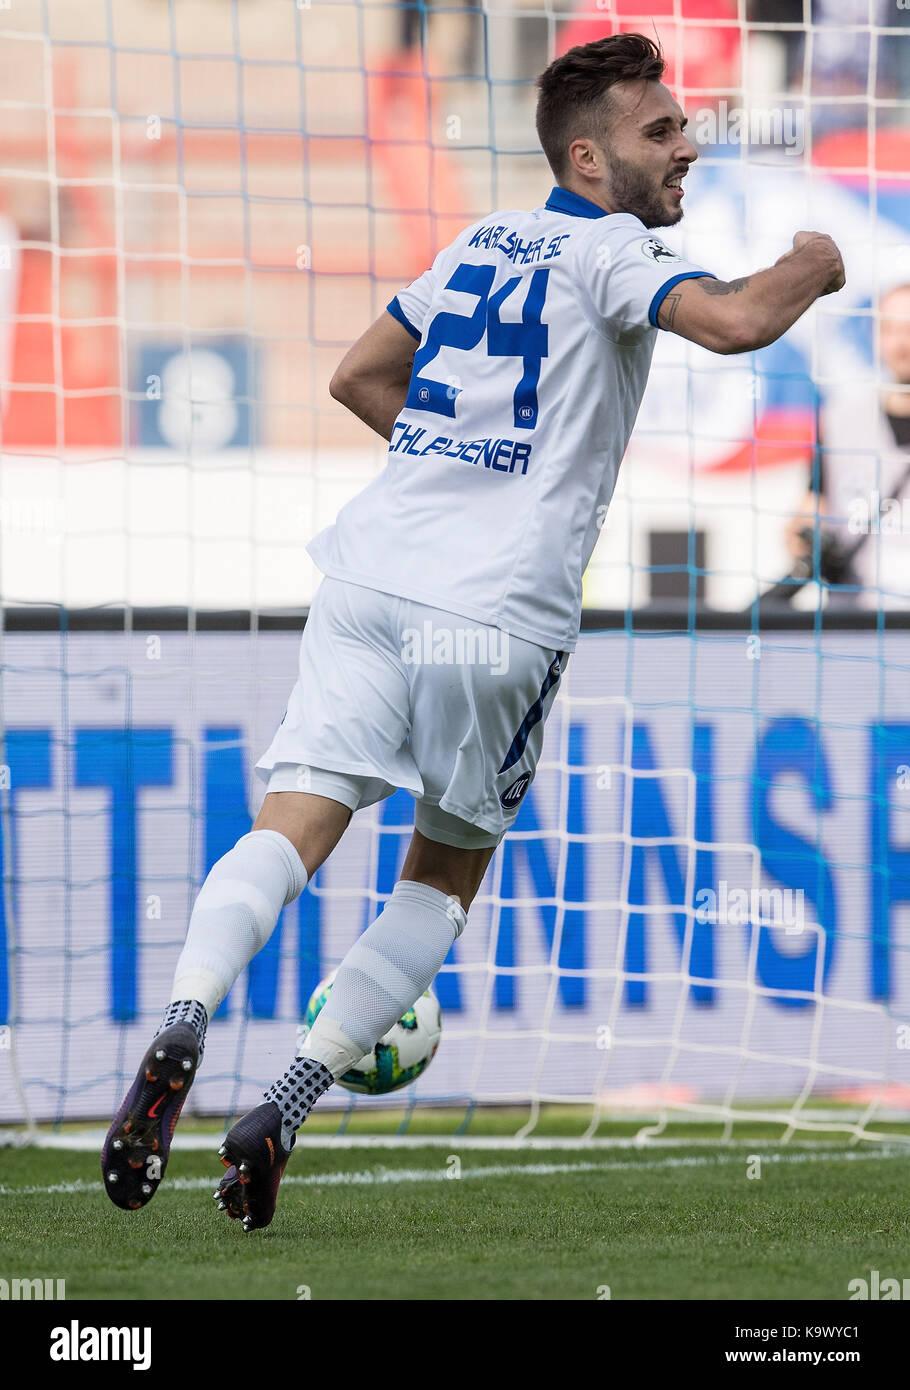 Jubel 2:0: Torschuetze Fabian Schleusener (KSC).  GES/ Fussball/ 3. Liga: Karlsruher SC - FC Rot-Weiss Erfurt, 24.09.2017 - Stock Image